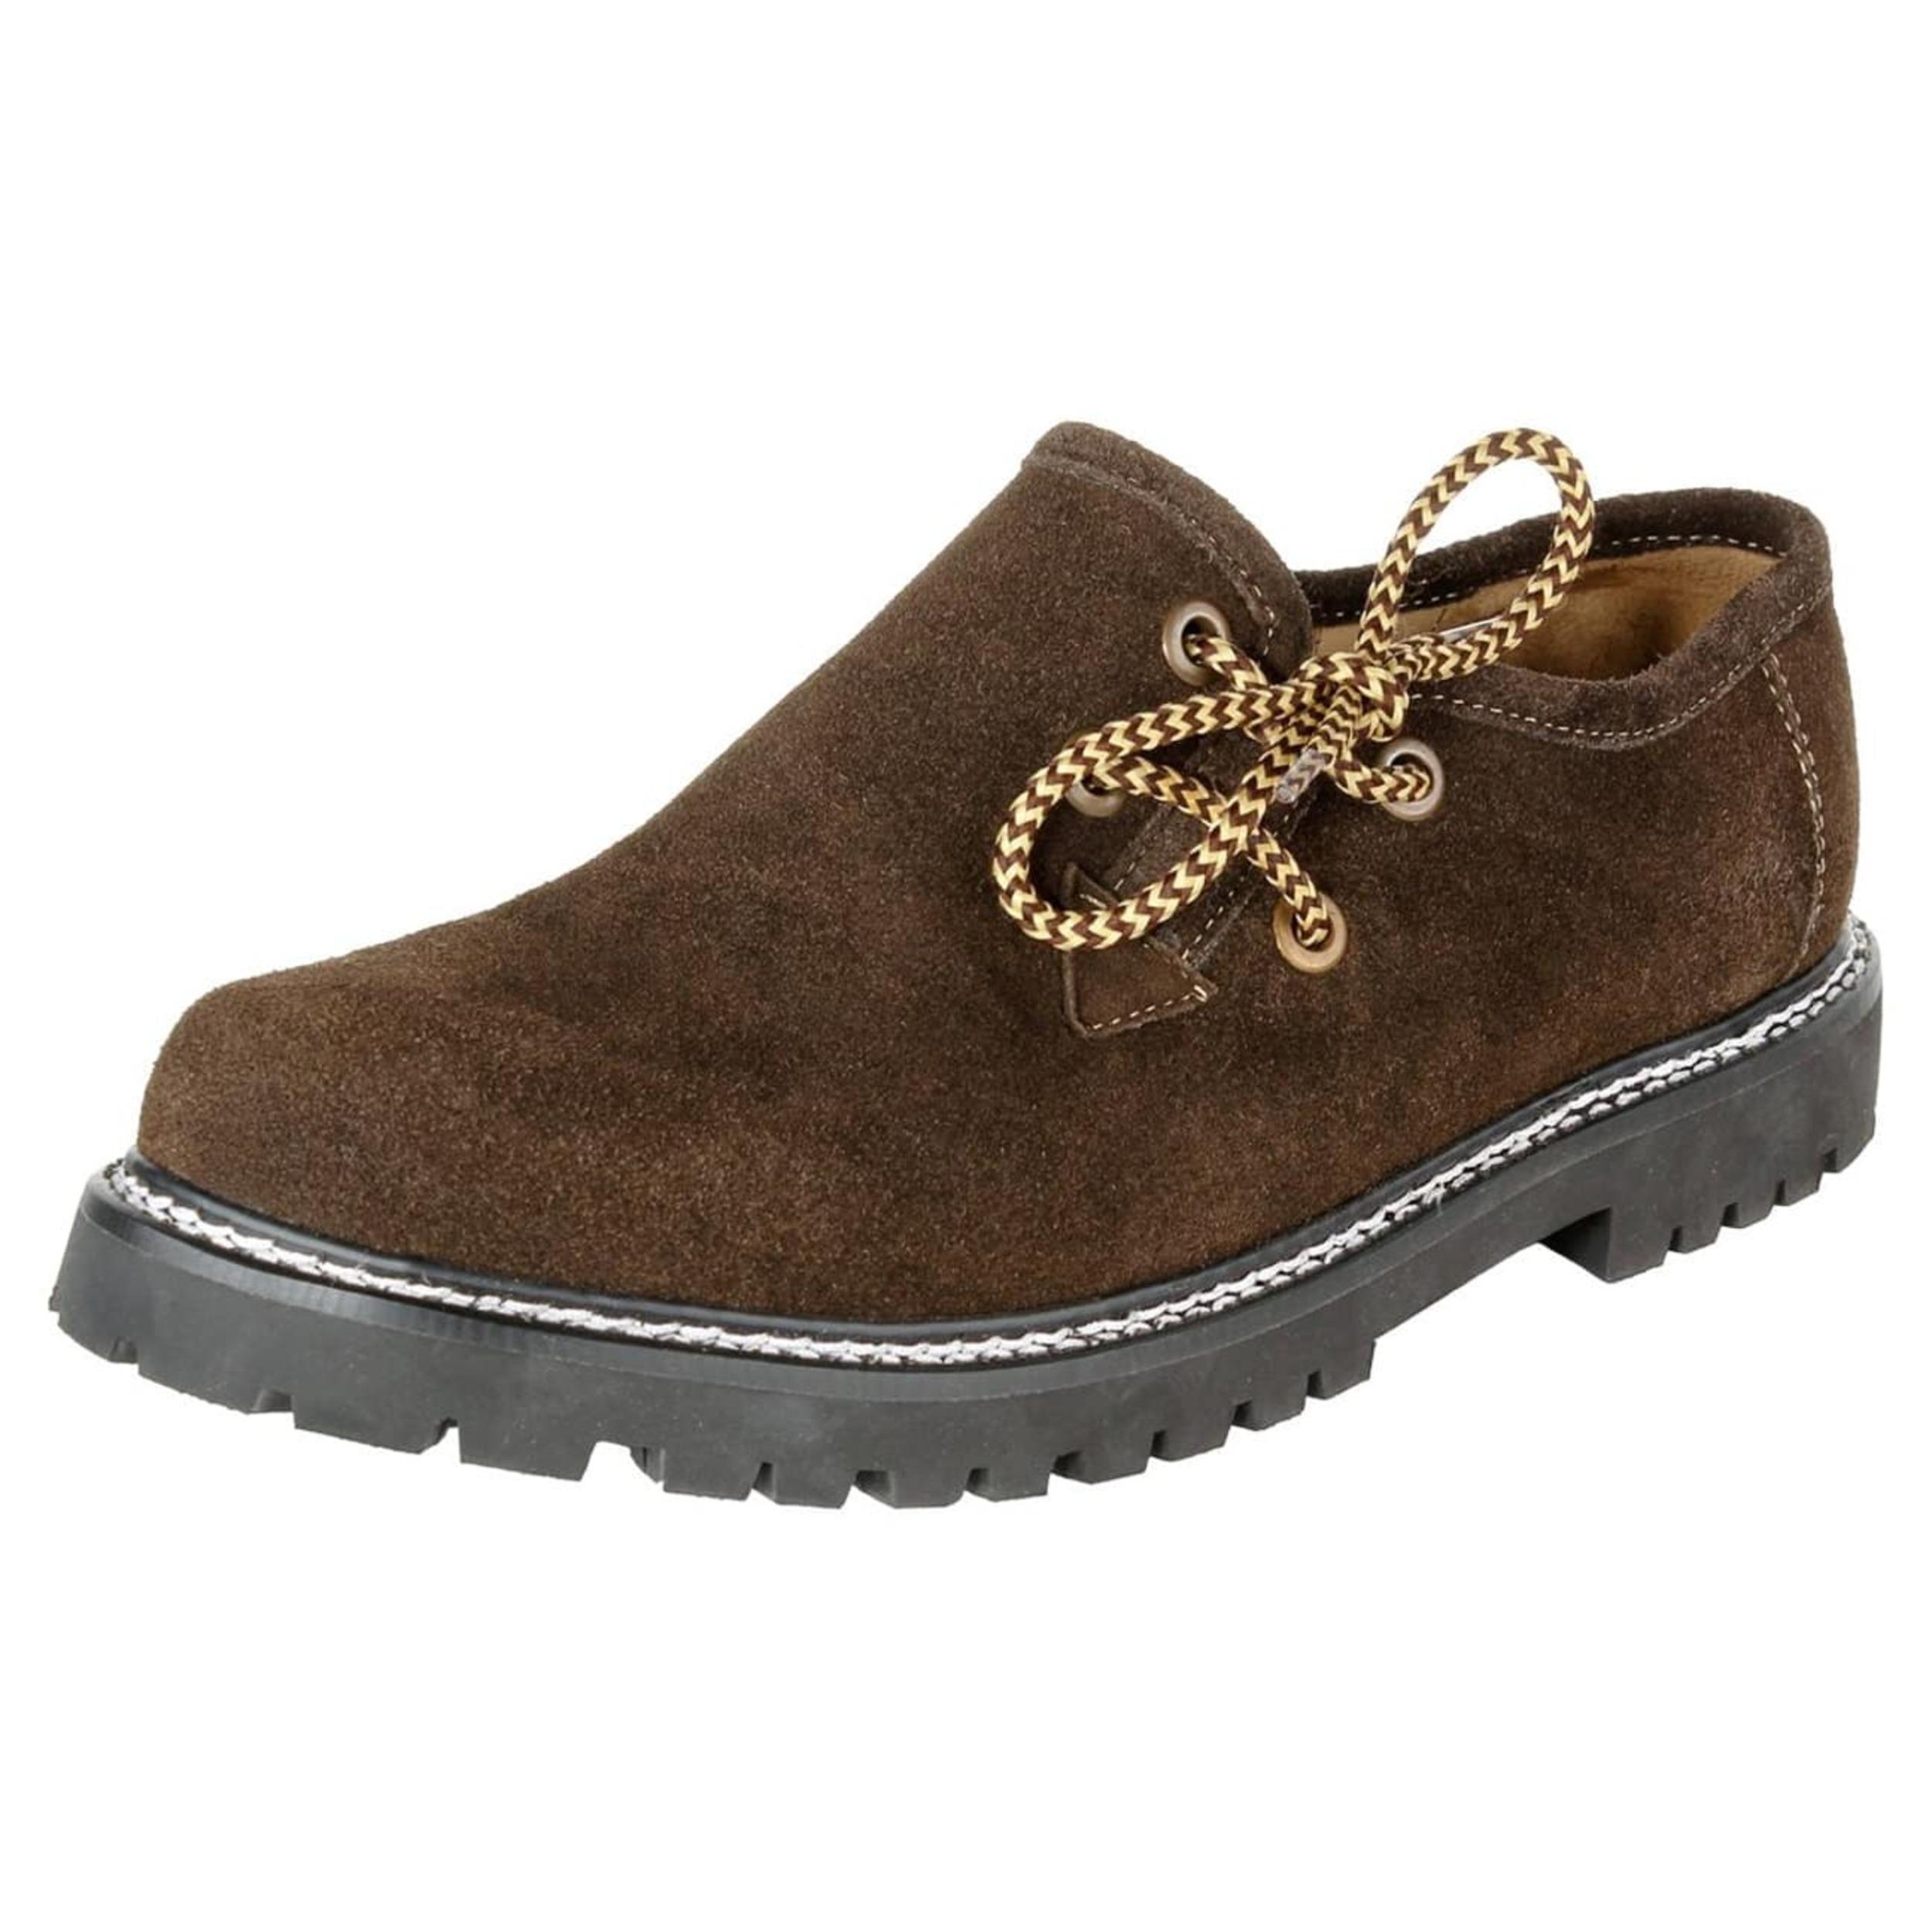 60b5759308b8 Bavarian Leather Shoes. by German Wear